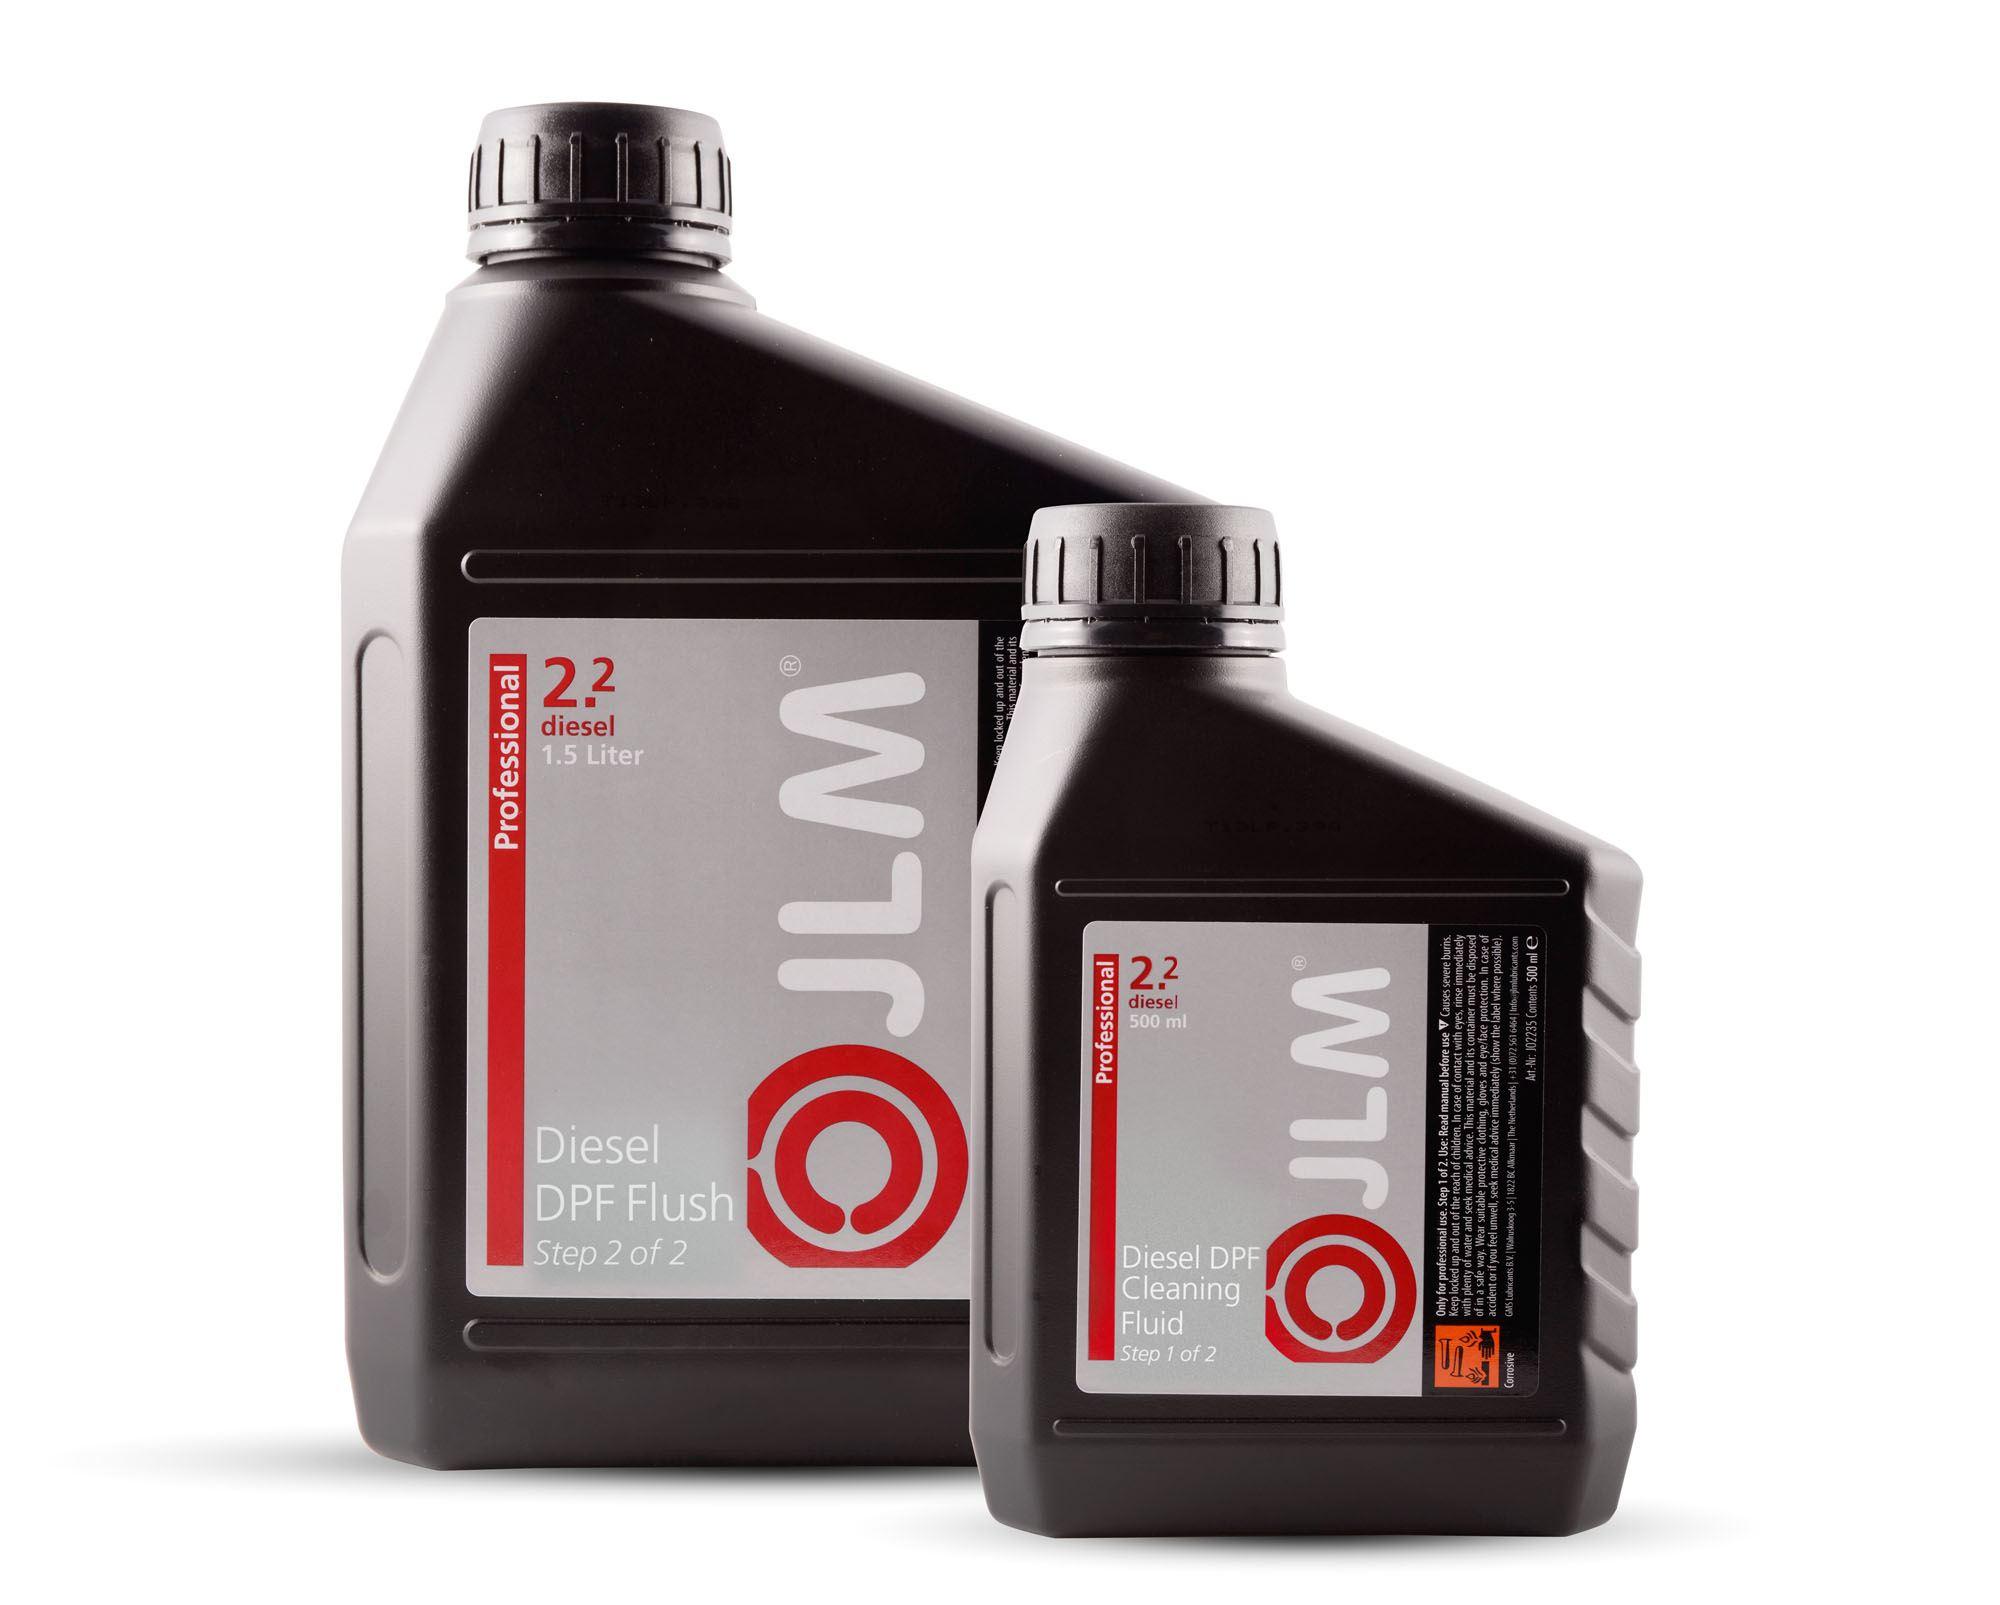 JLM Diesel DPF Cleaning & Flush Fluidpack J02230